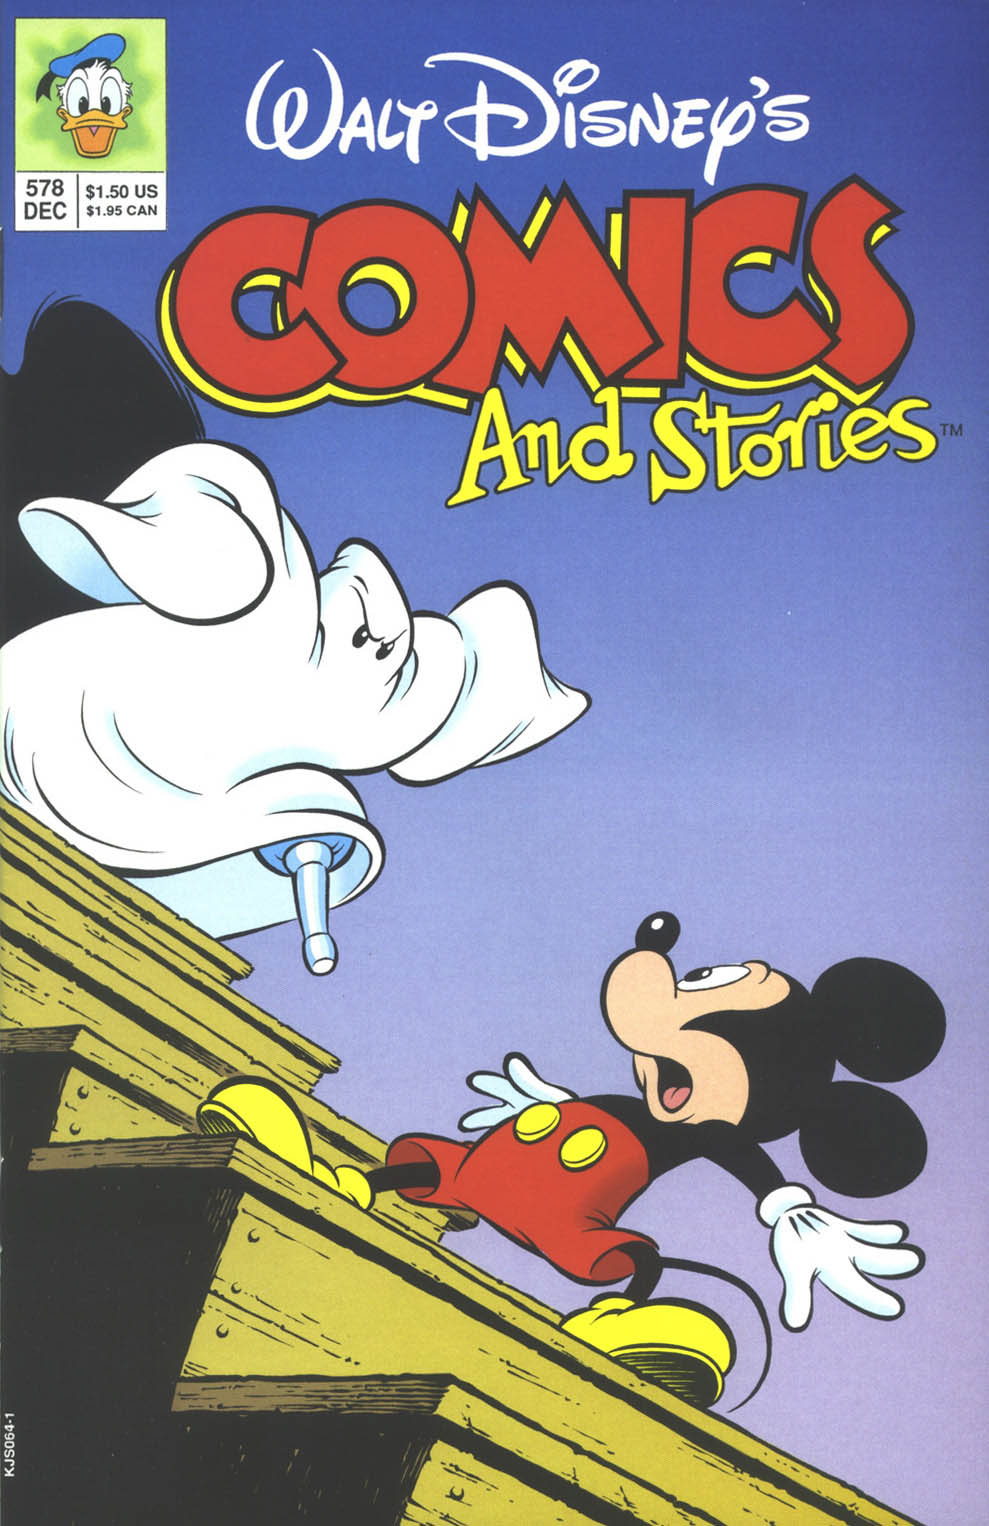 Walt Disneys Comics and Stories 578 Page 1